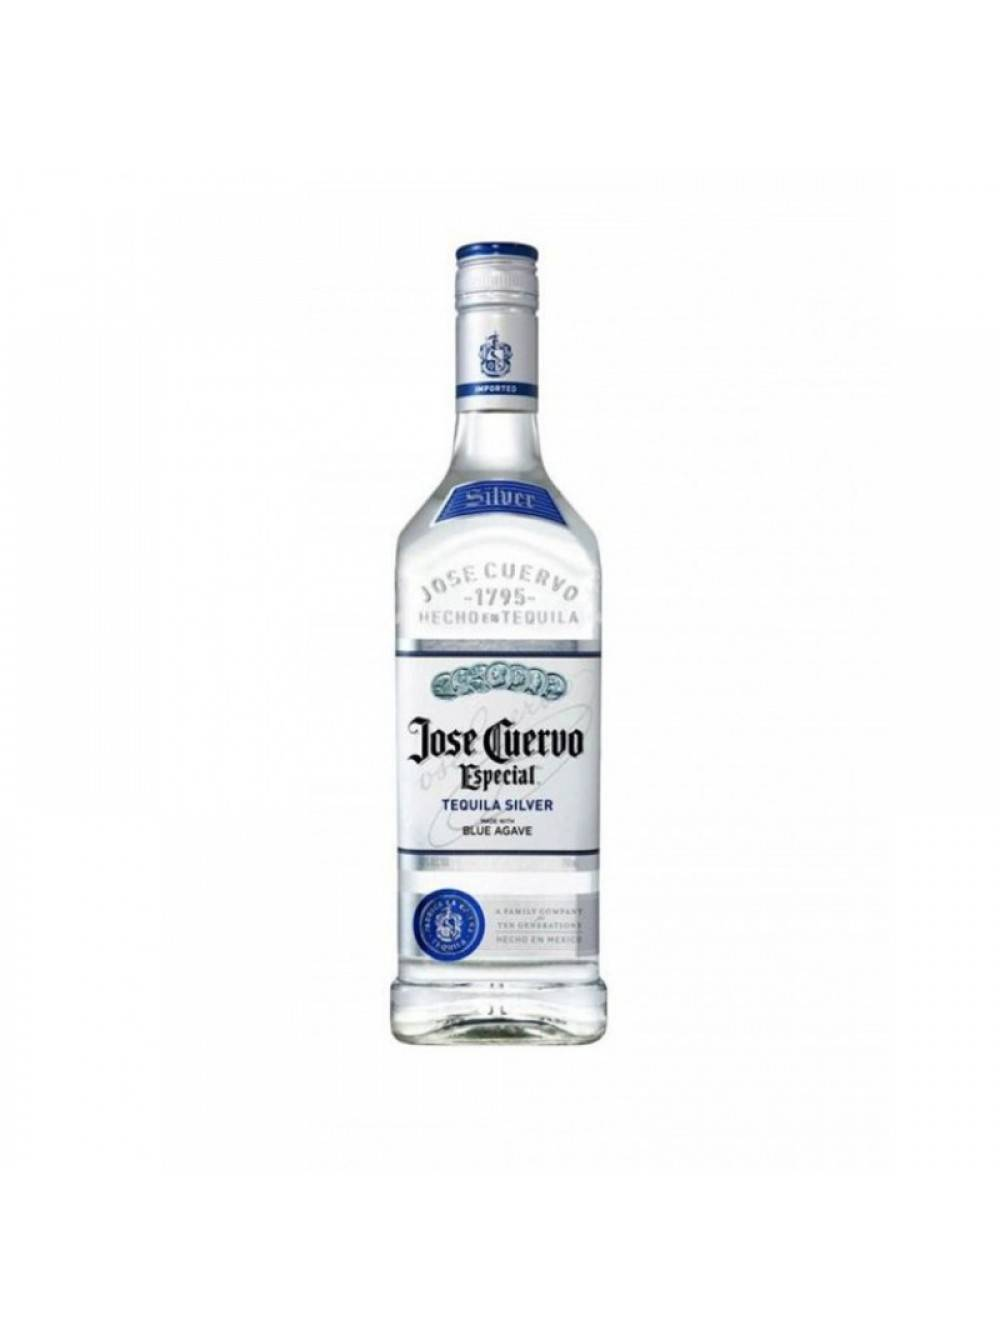 Текила jose cuervo (хосе куэрво) — характеристика и обзор, впечатления потребителей от напитка